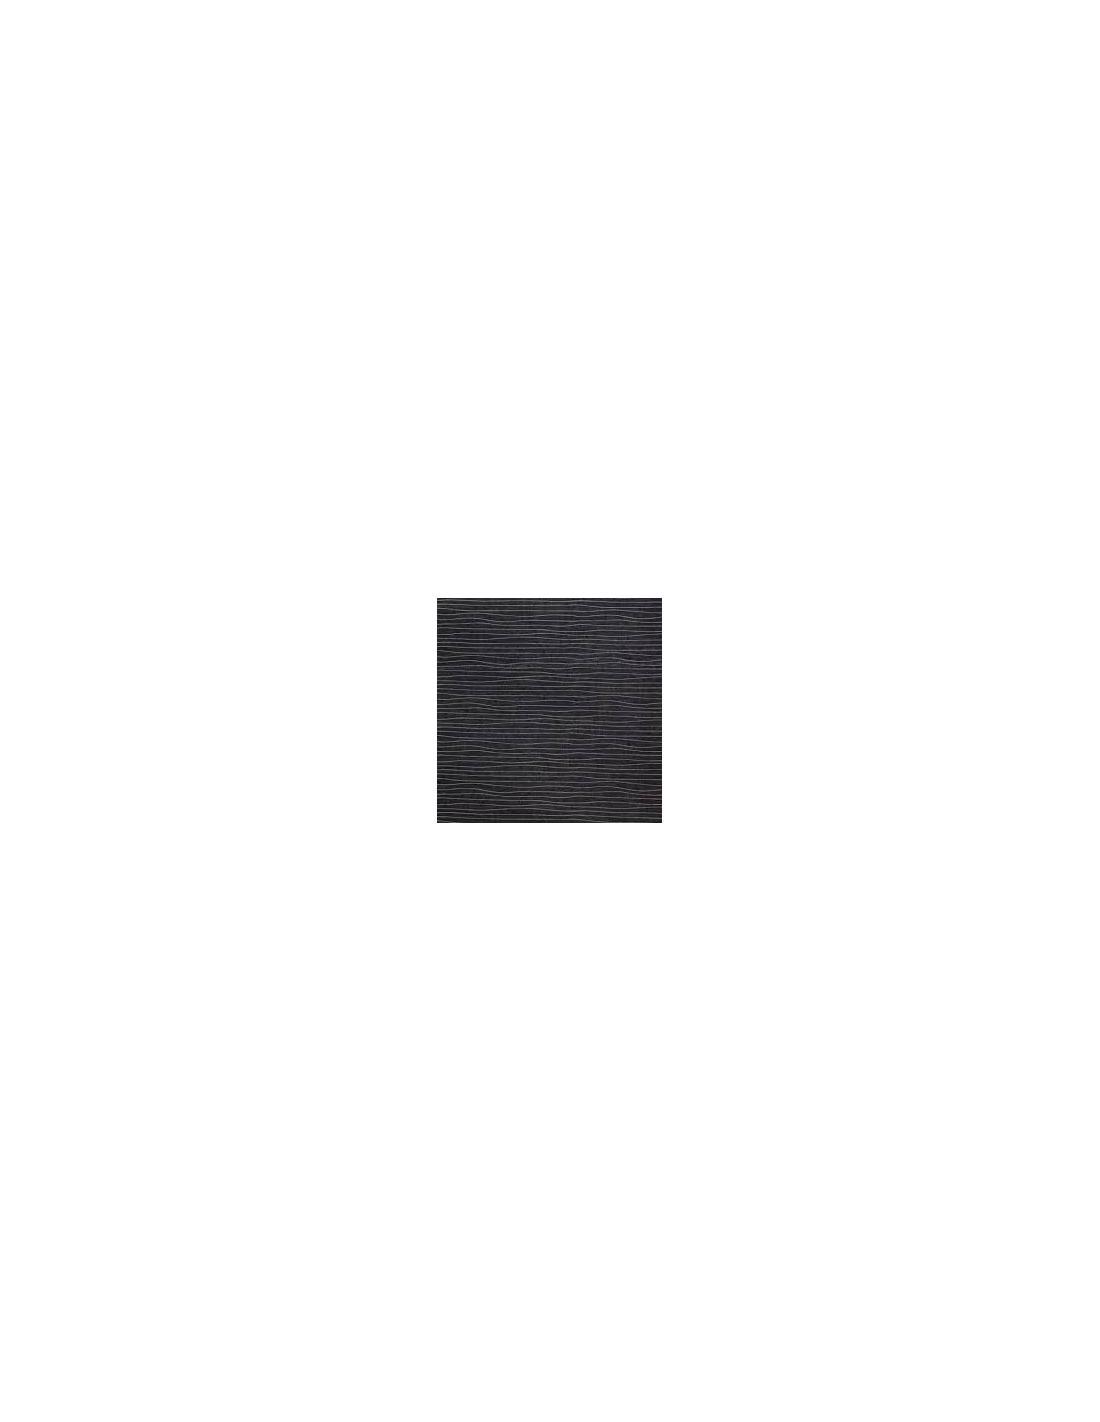 LAMPE shade Ï460 black w.waves 'MY CHOICE' - EGLO - 1